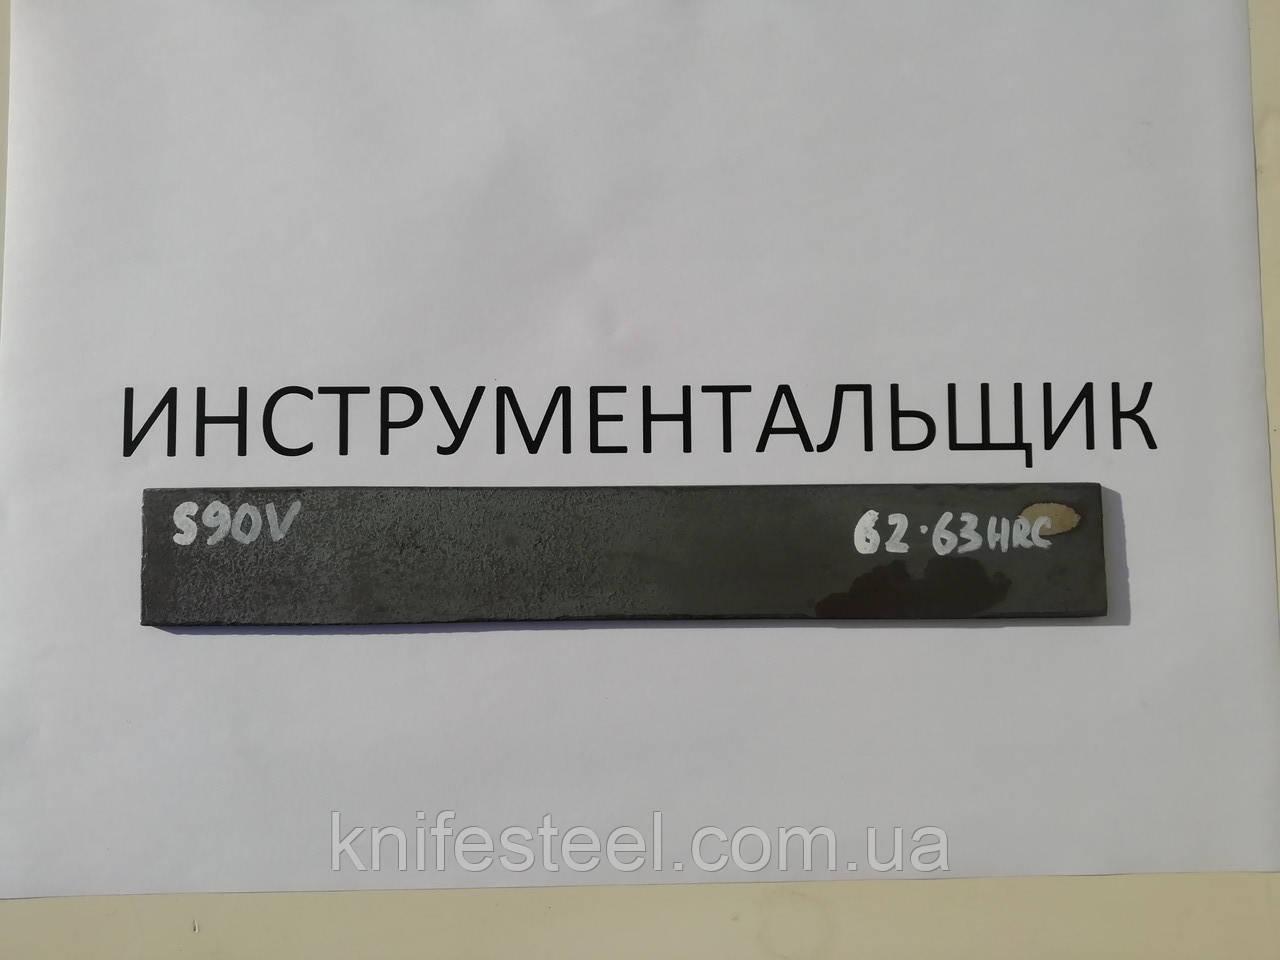 Заготовка для ножа сталь CPM S90V 150х30х4.6 мм термообработка (62-63 HRC)